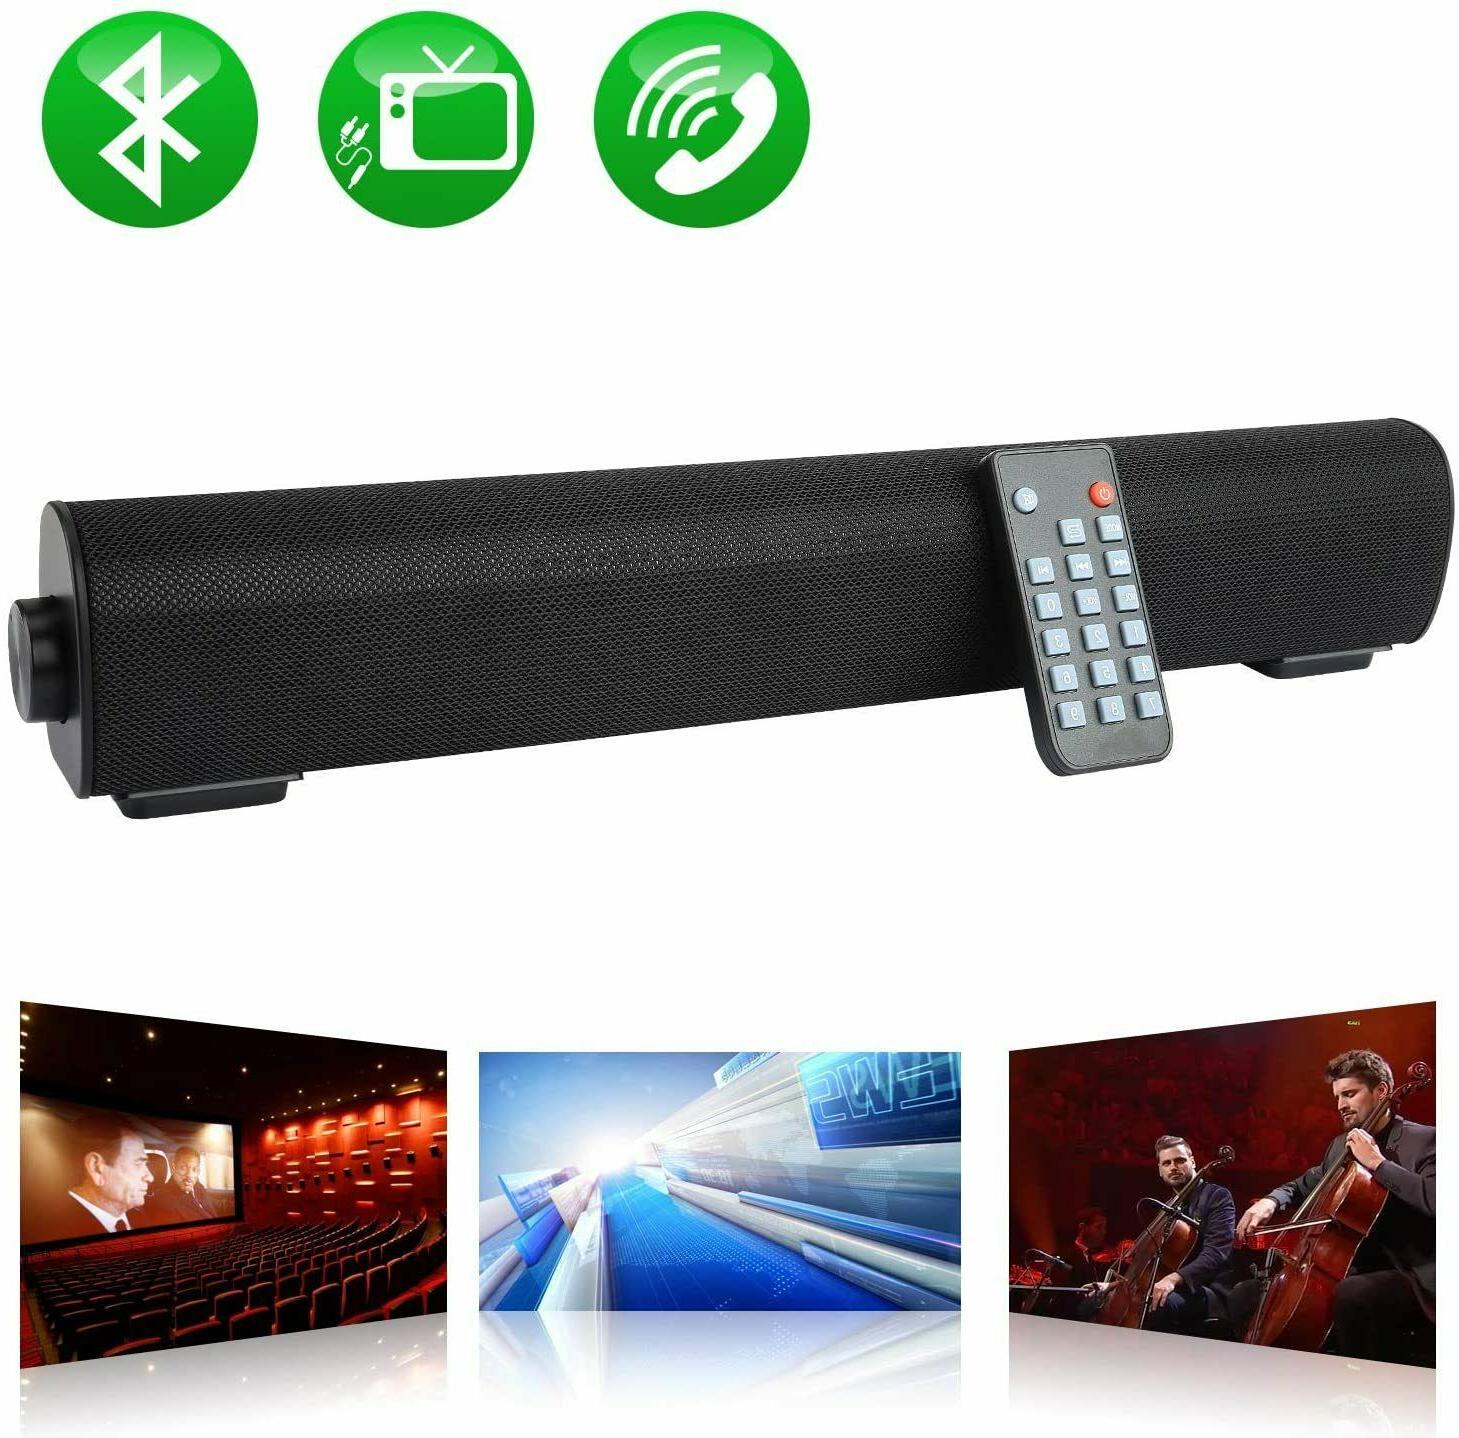 Wireless Bluetooth Bar 20W Soundbar Channel USA